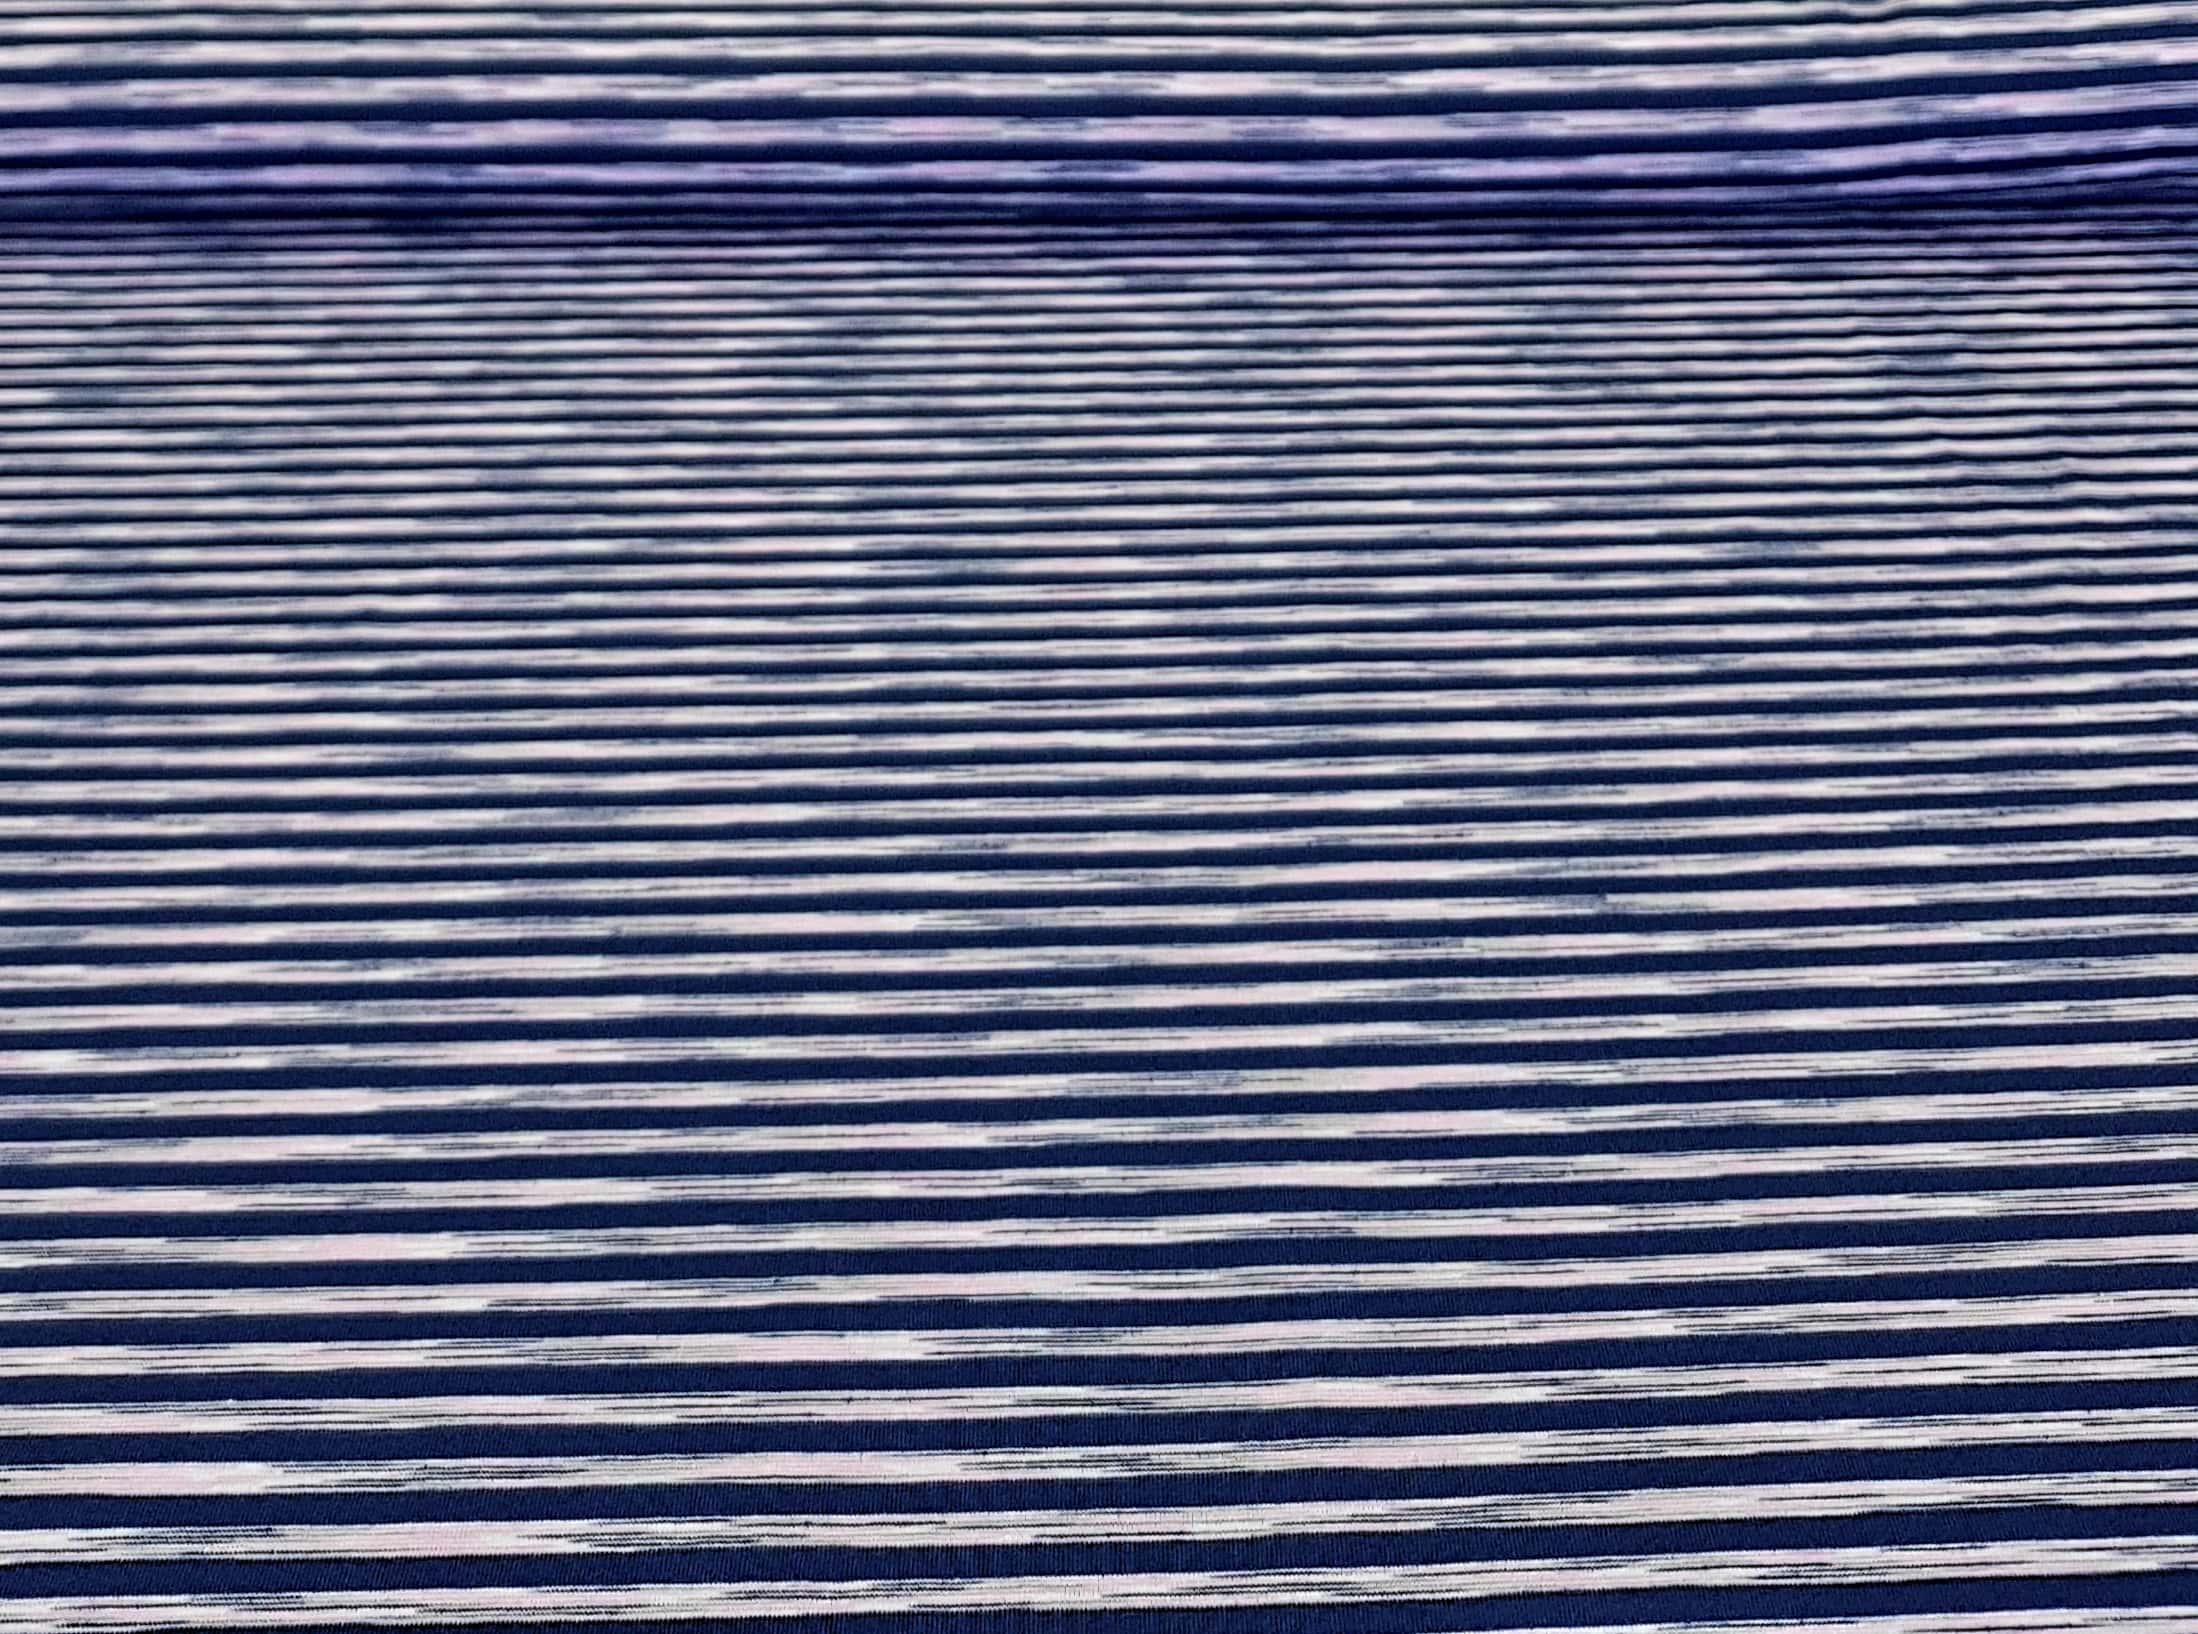 bedruktetricotmetstreepdonkerblauwroze-min